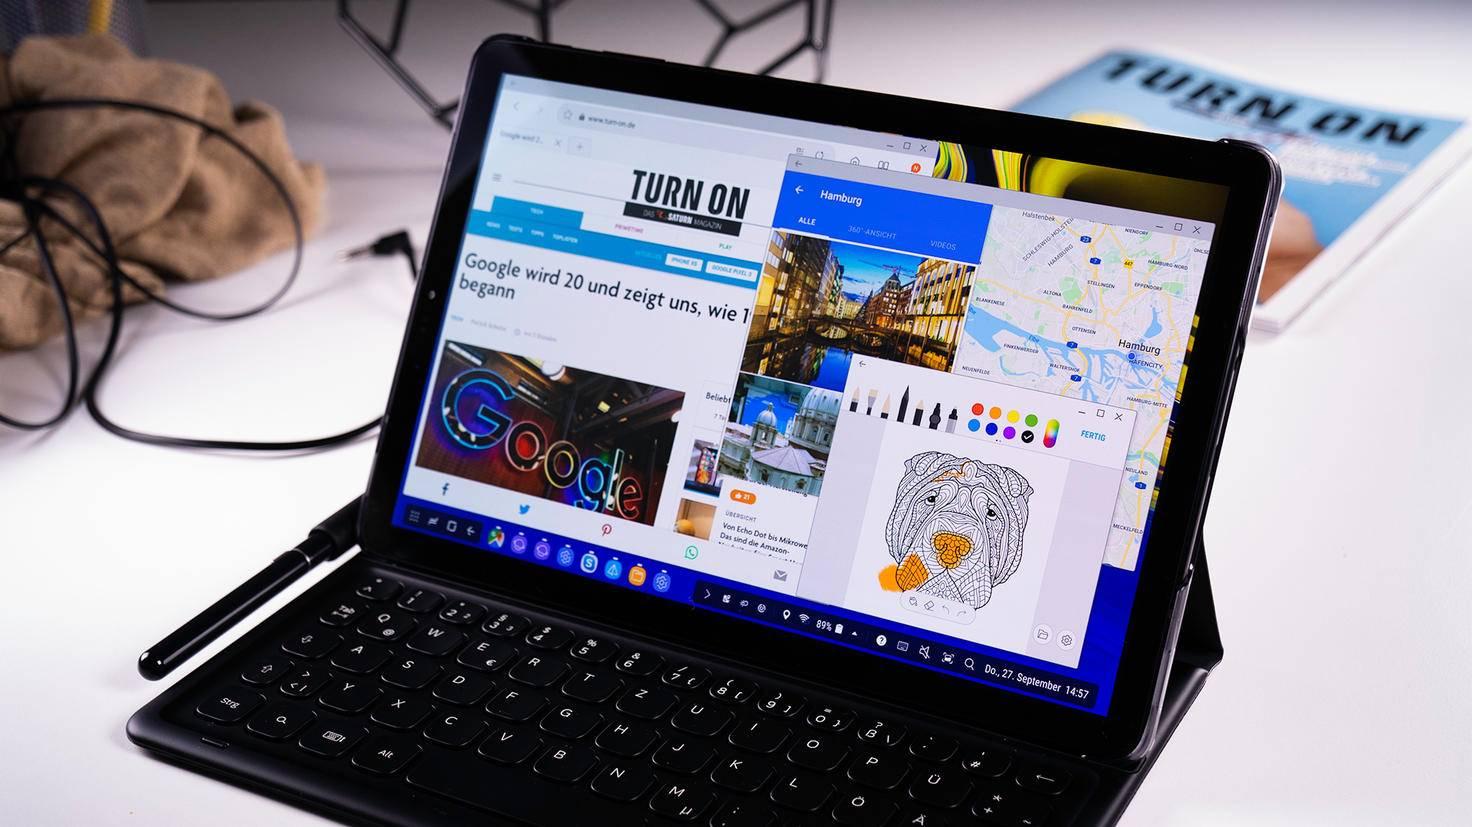 Samsung-Galaxy-Tab-S4-TURN-ON-6